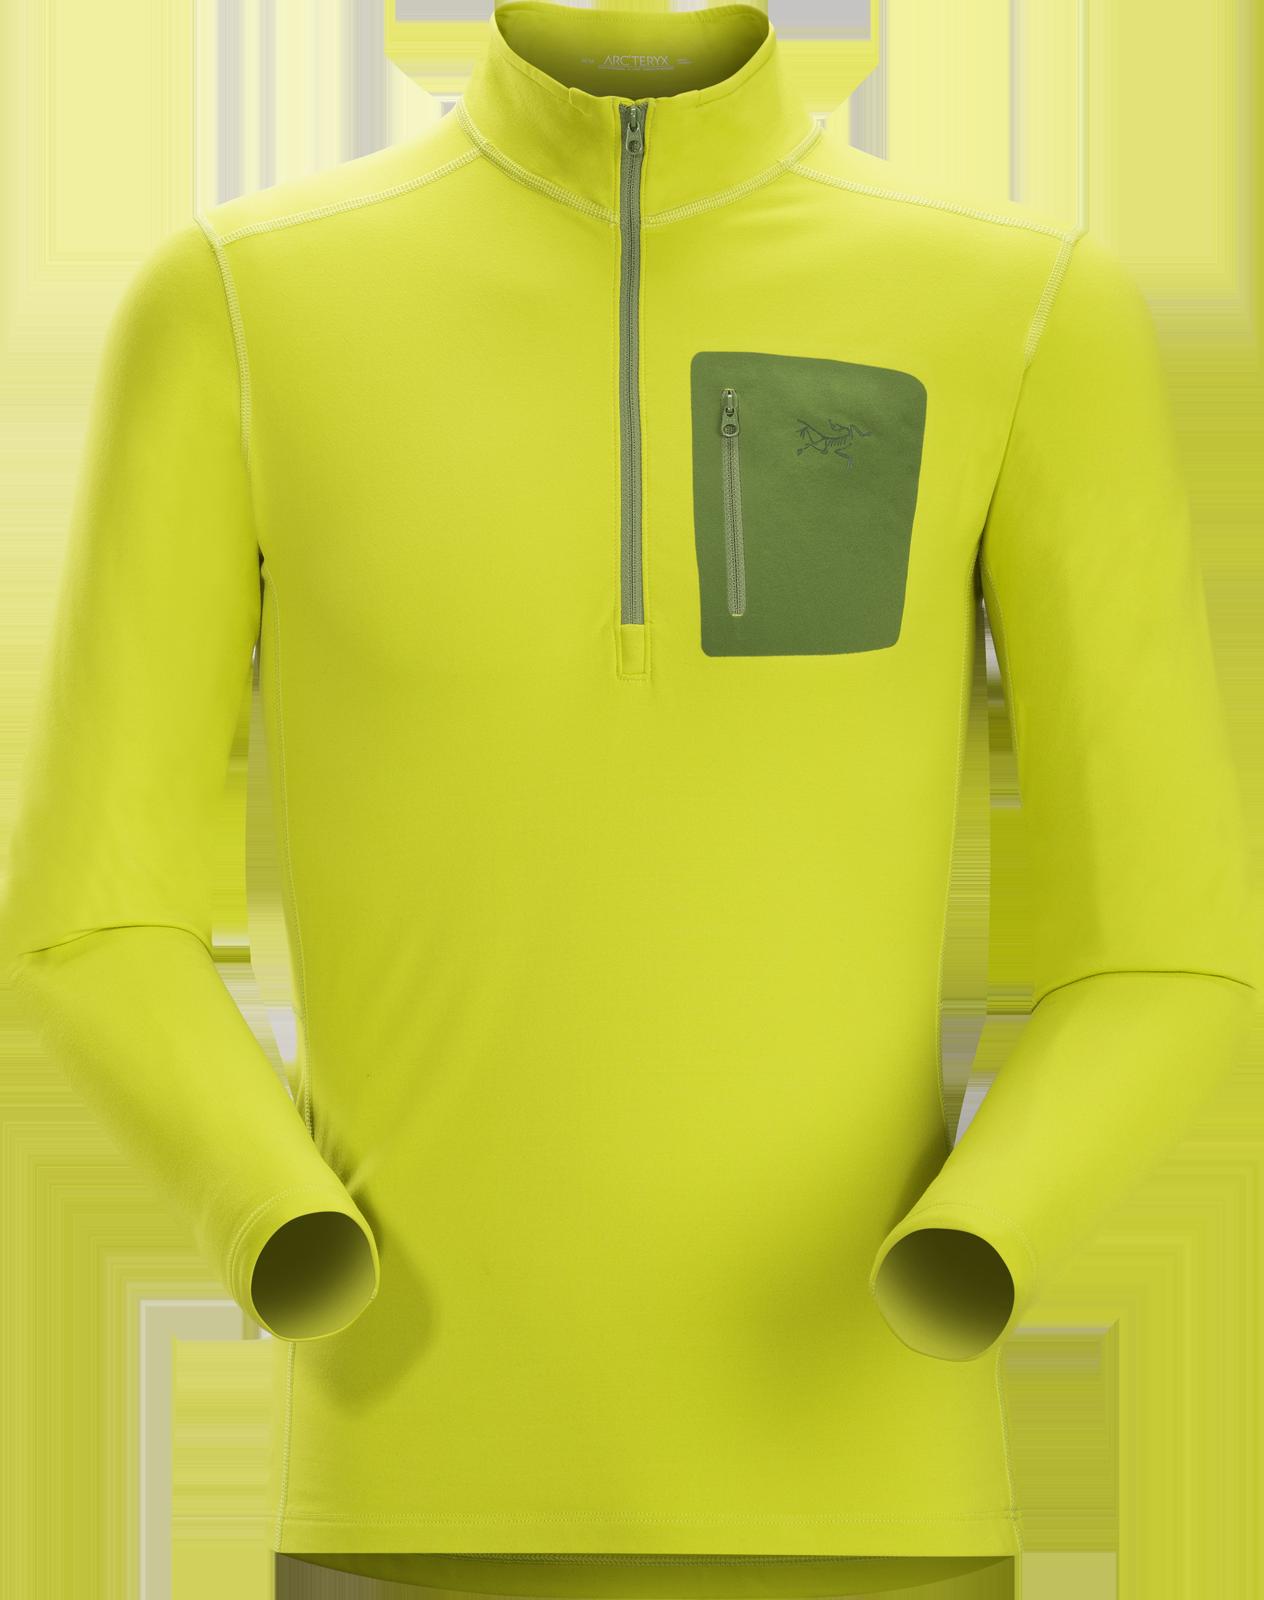 мужская футболка arcteryx, желтая